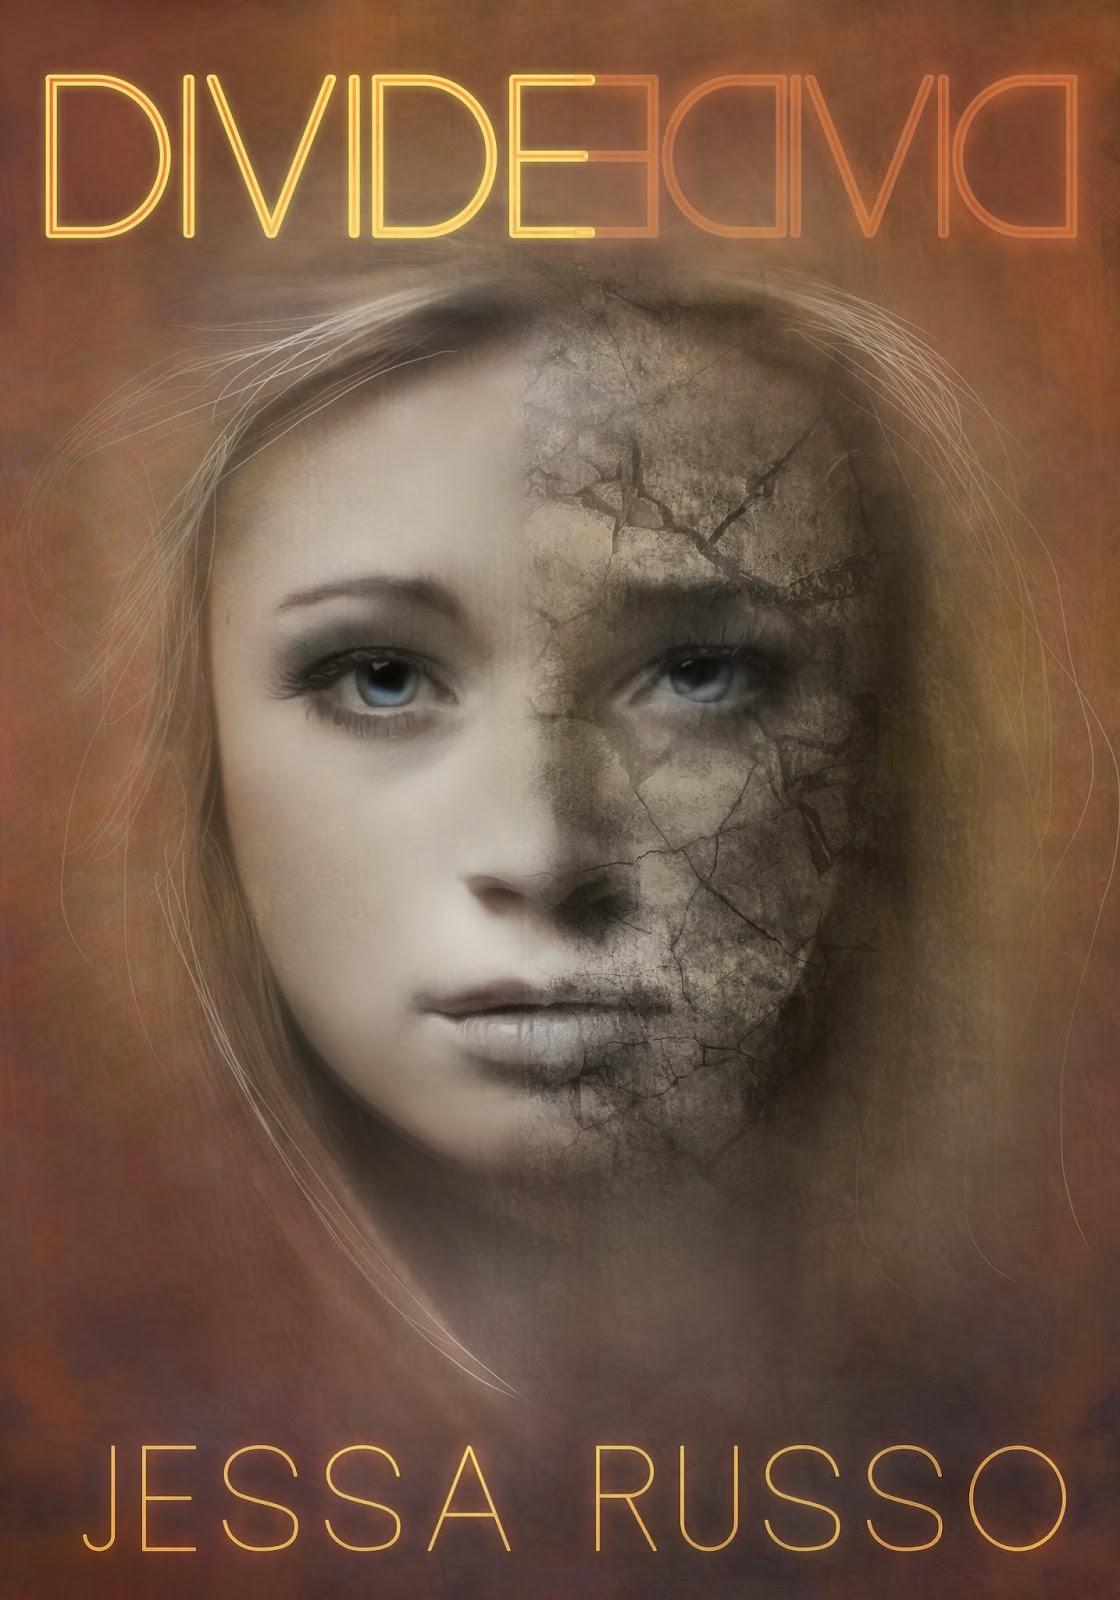 Jessa Russo | Jamie Ayres